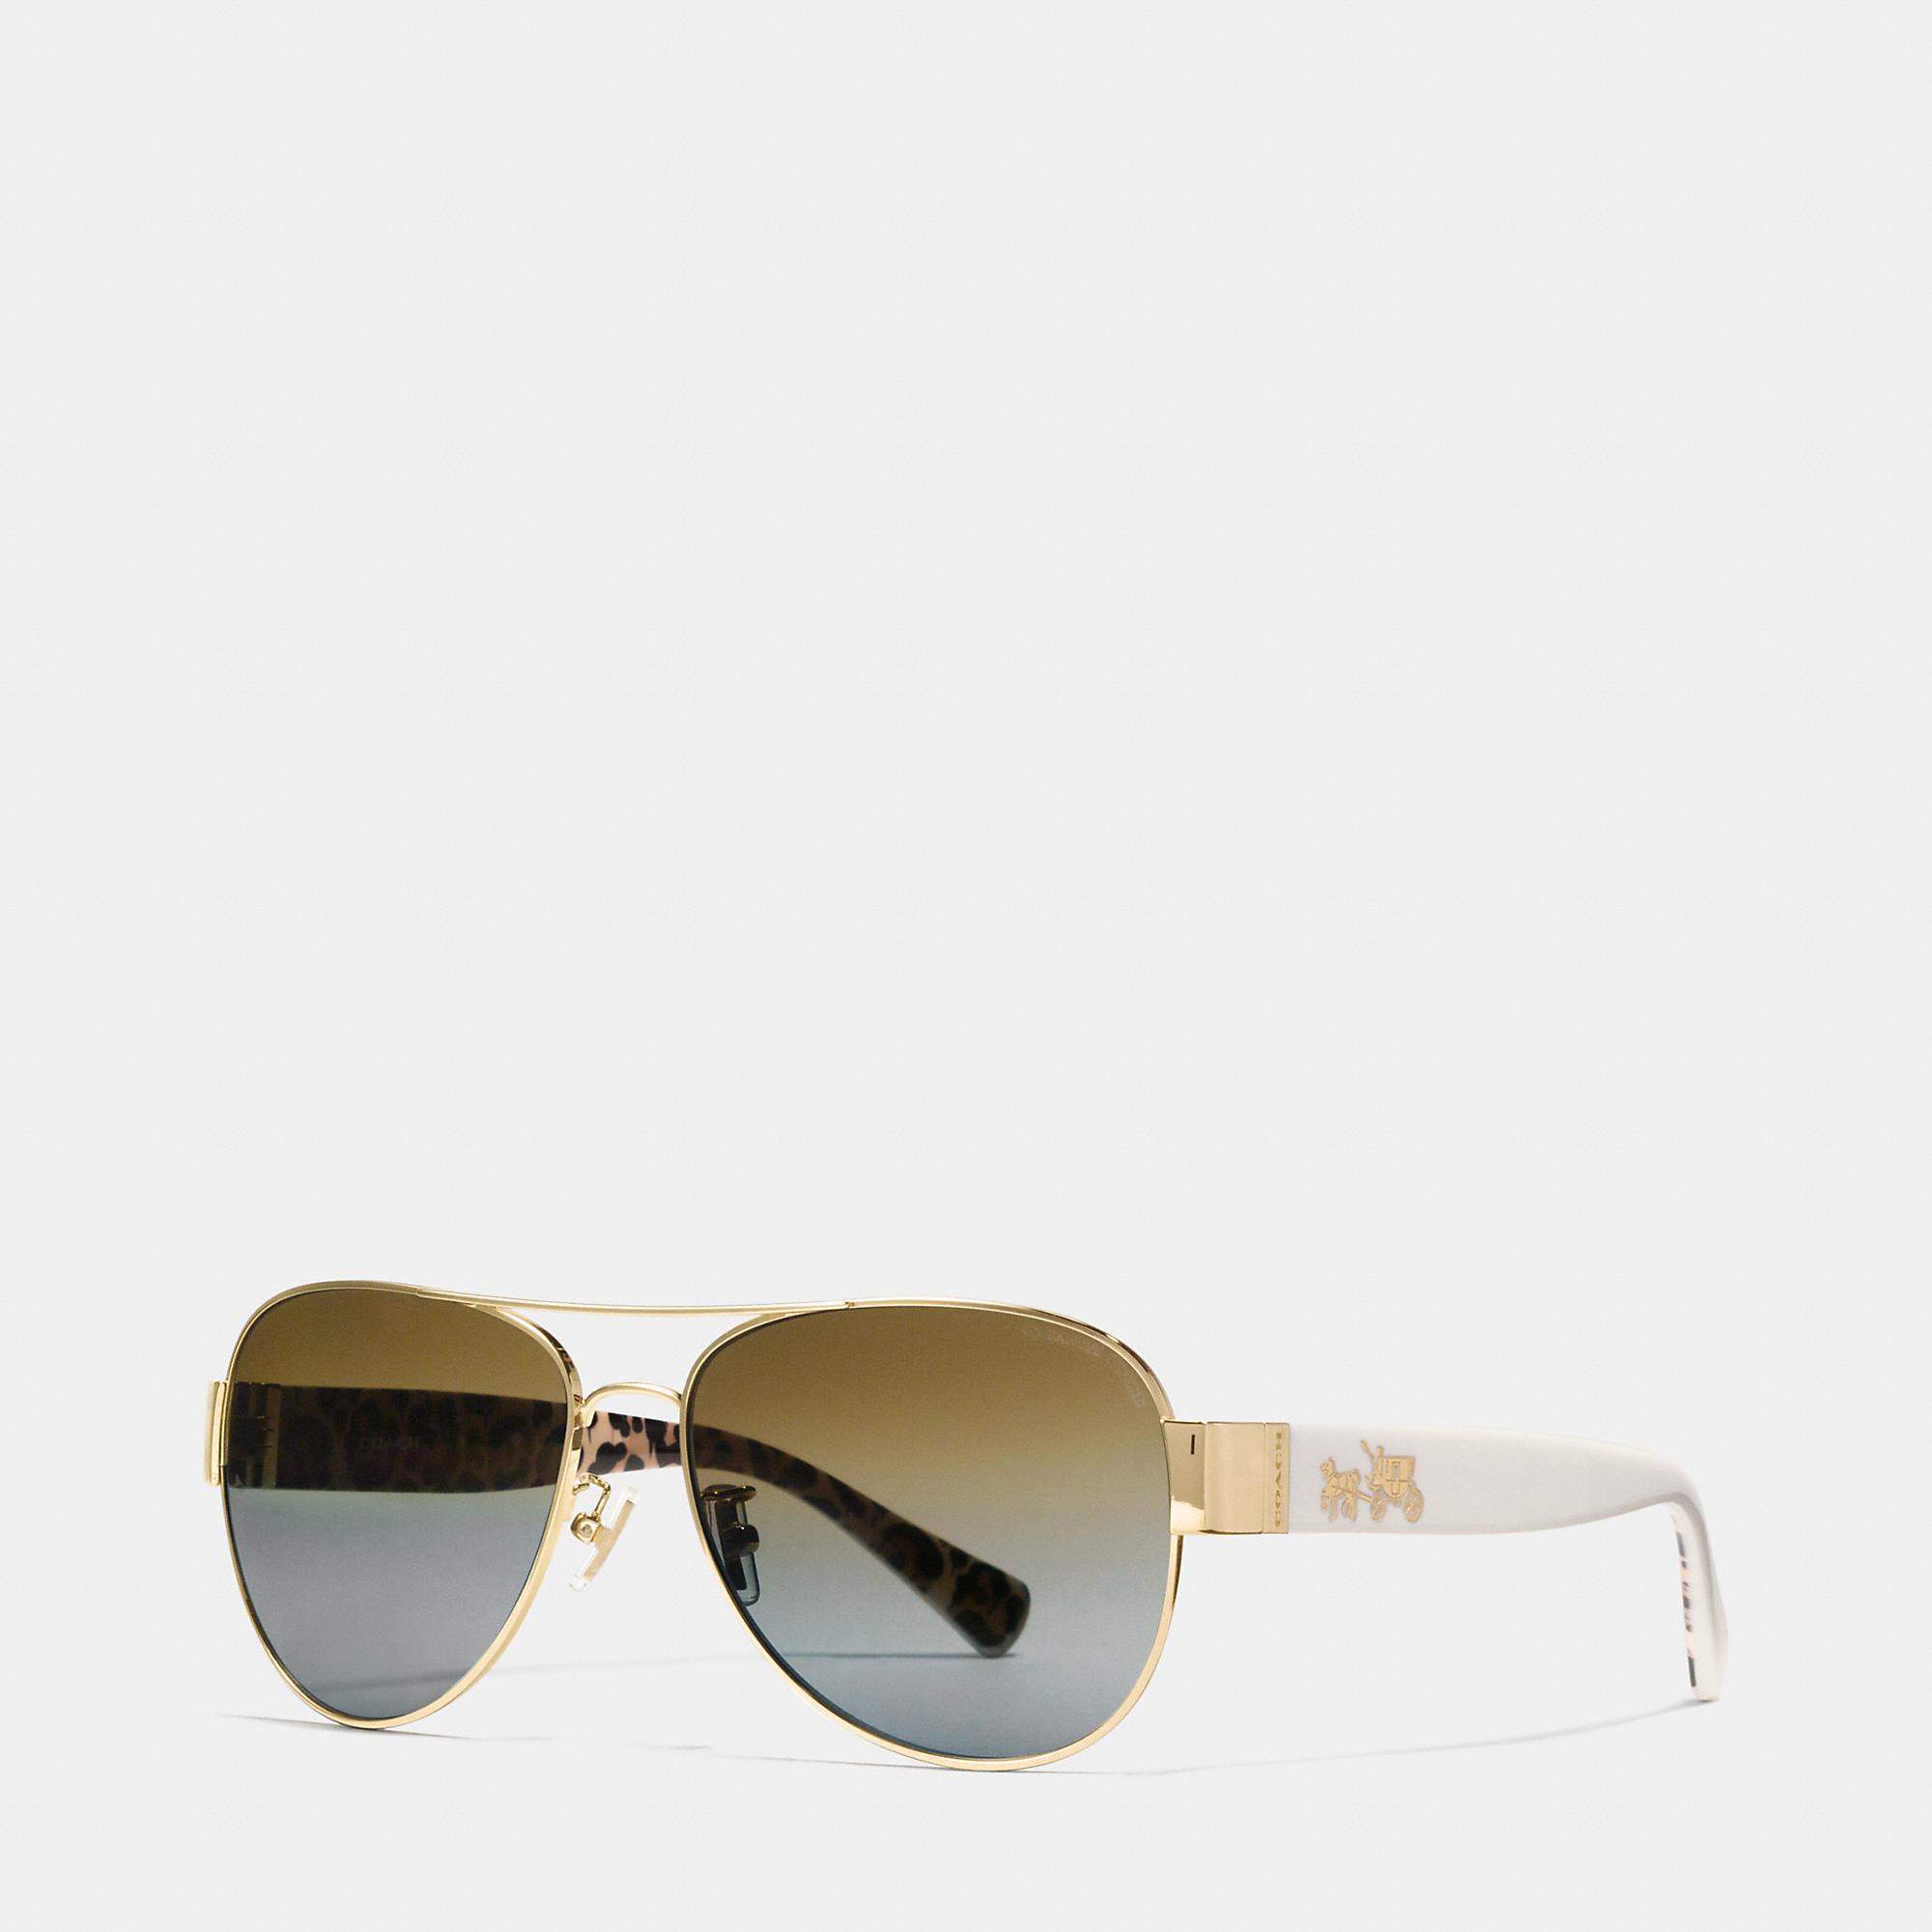 d51d8e7d315 Lyst - COACH Horse And Carriage Pilot Polarized Sunglasses in Metallic